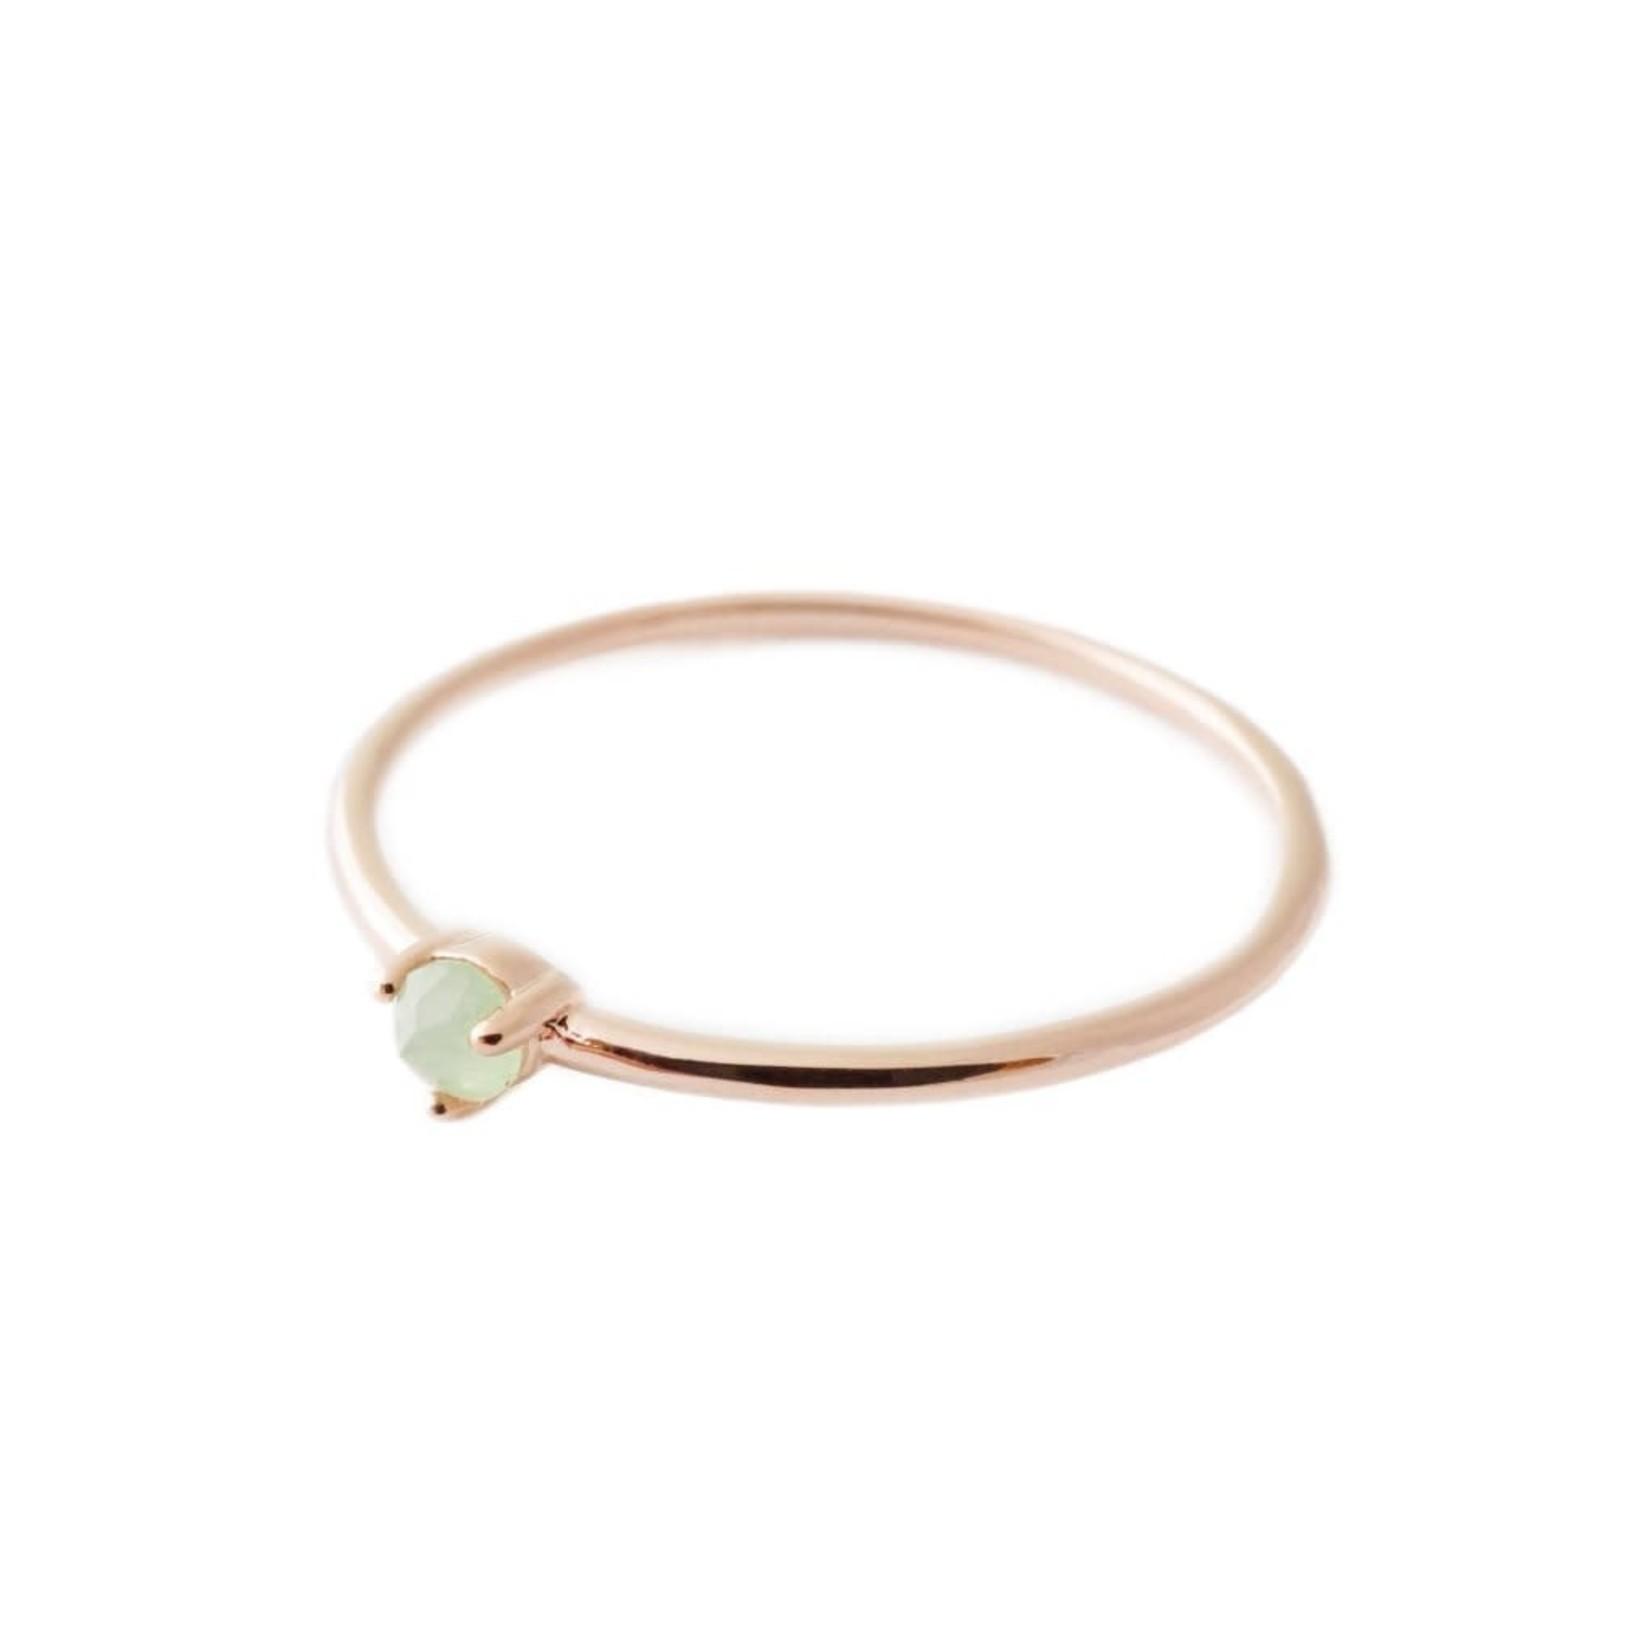 Honeycat Jewelry Honeycat Point Solitaire Ring JADE Rose Gold